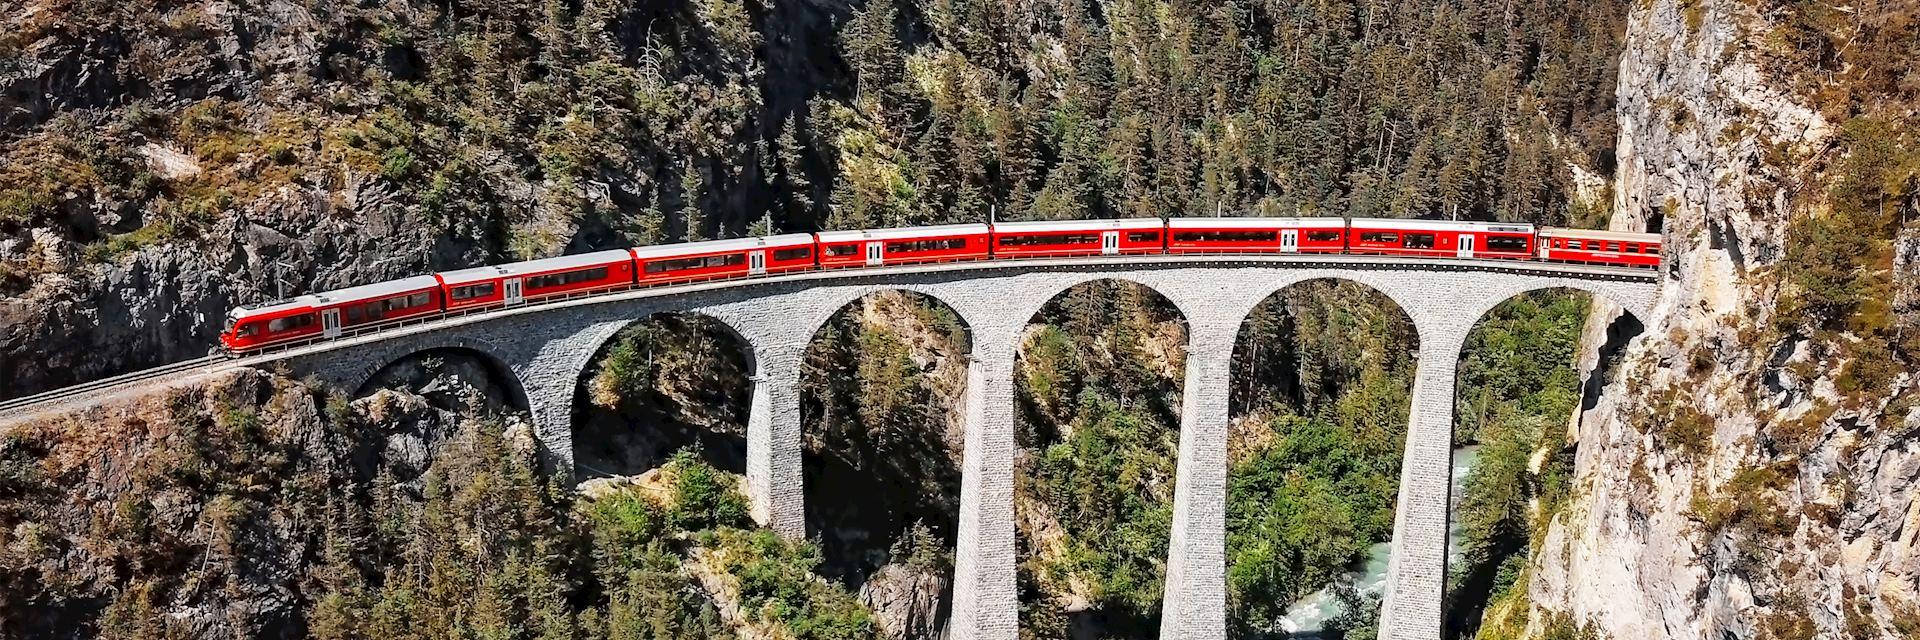 Glacier Express passing over the Landwasser Viaduct, Switzerland